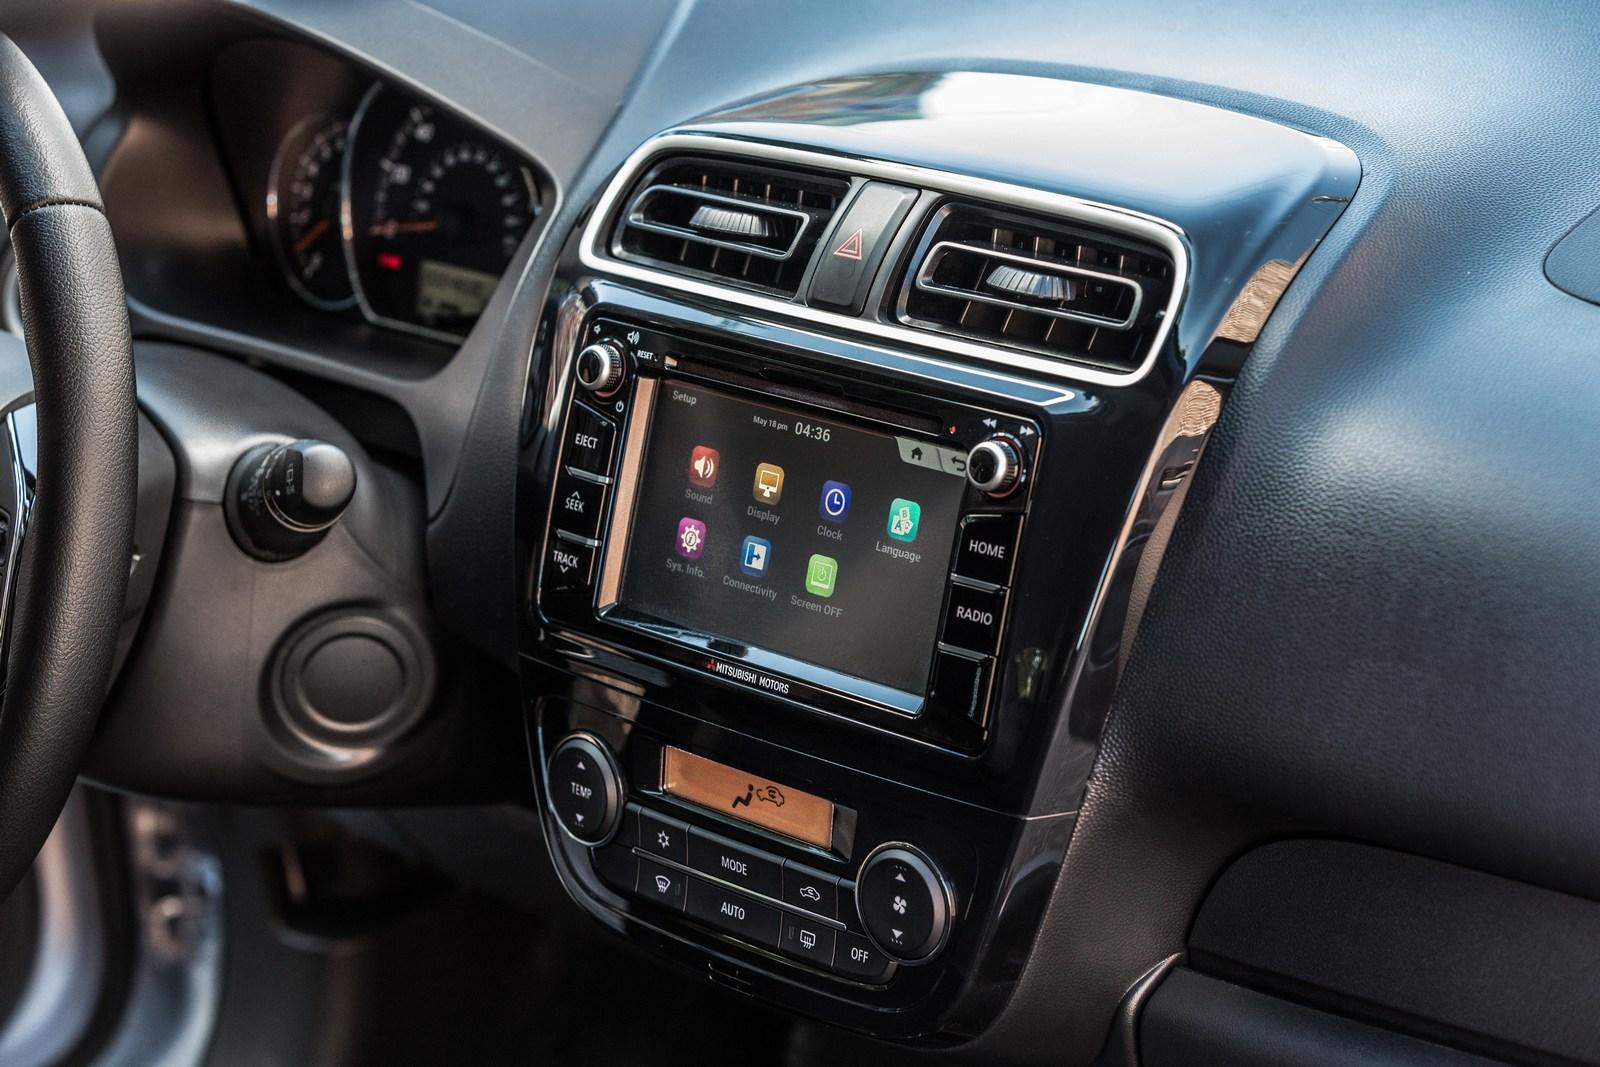 All New Mitsubishi Mirage To Share Cmf B Platform With Renault Clio on Mitsubishi Lancer Evolution